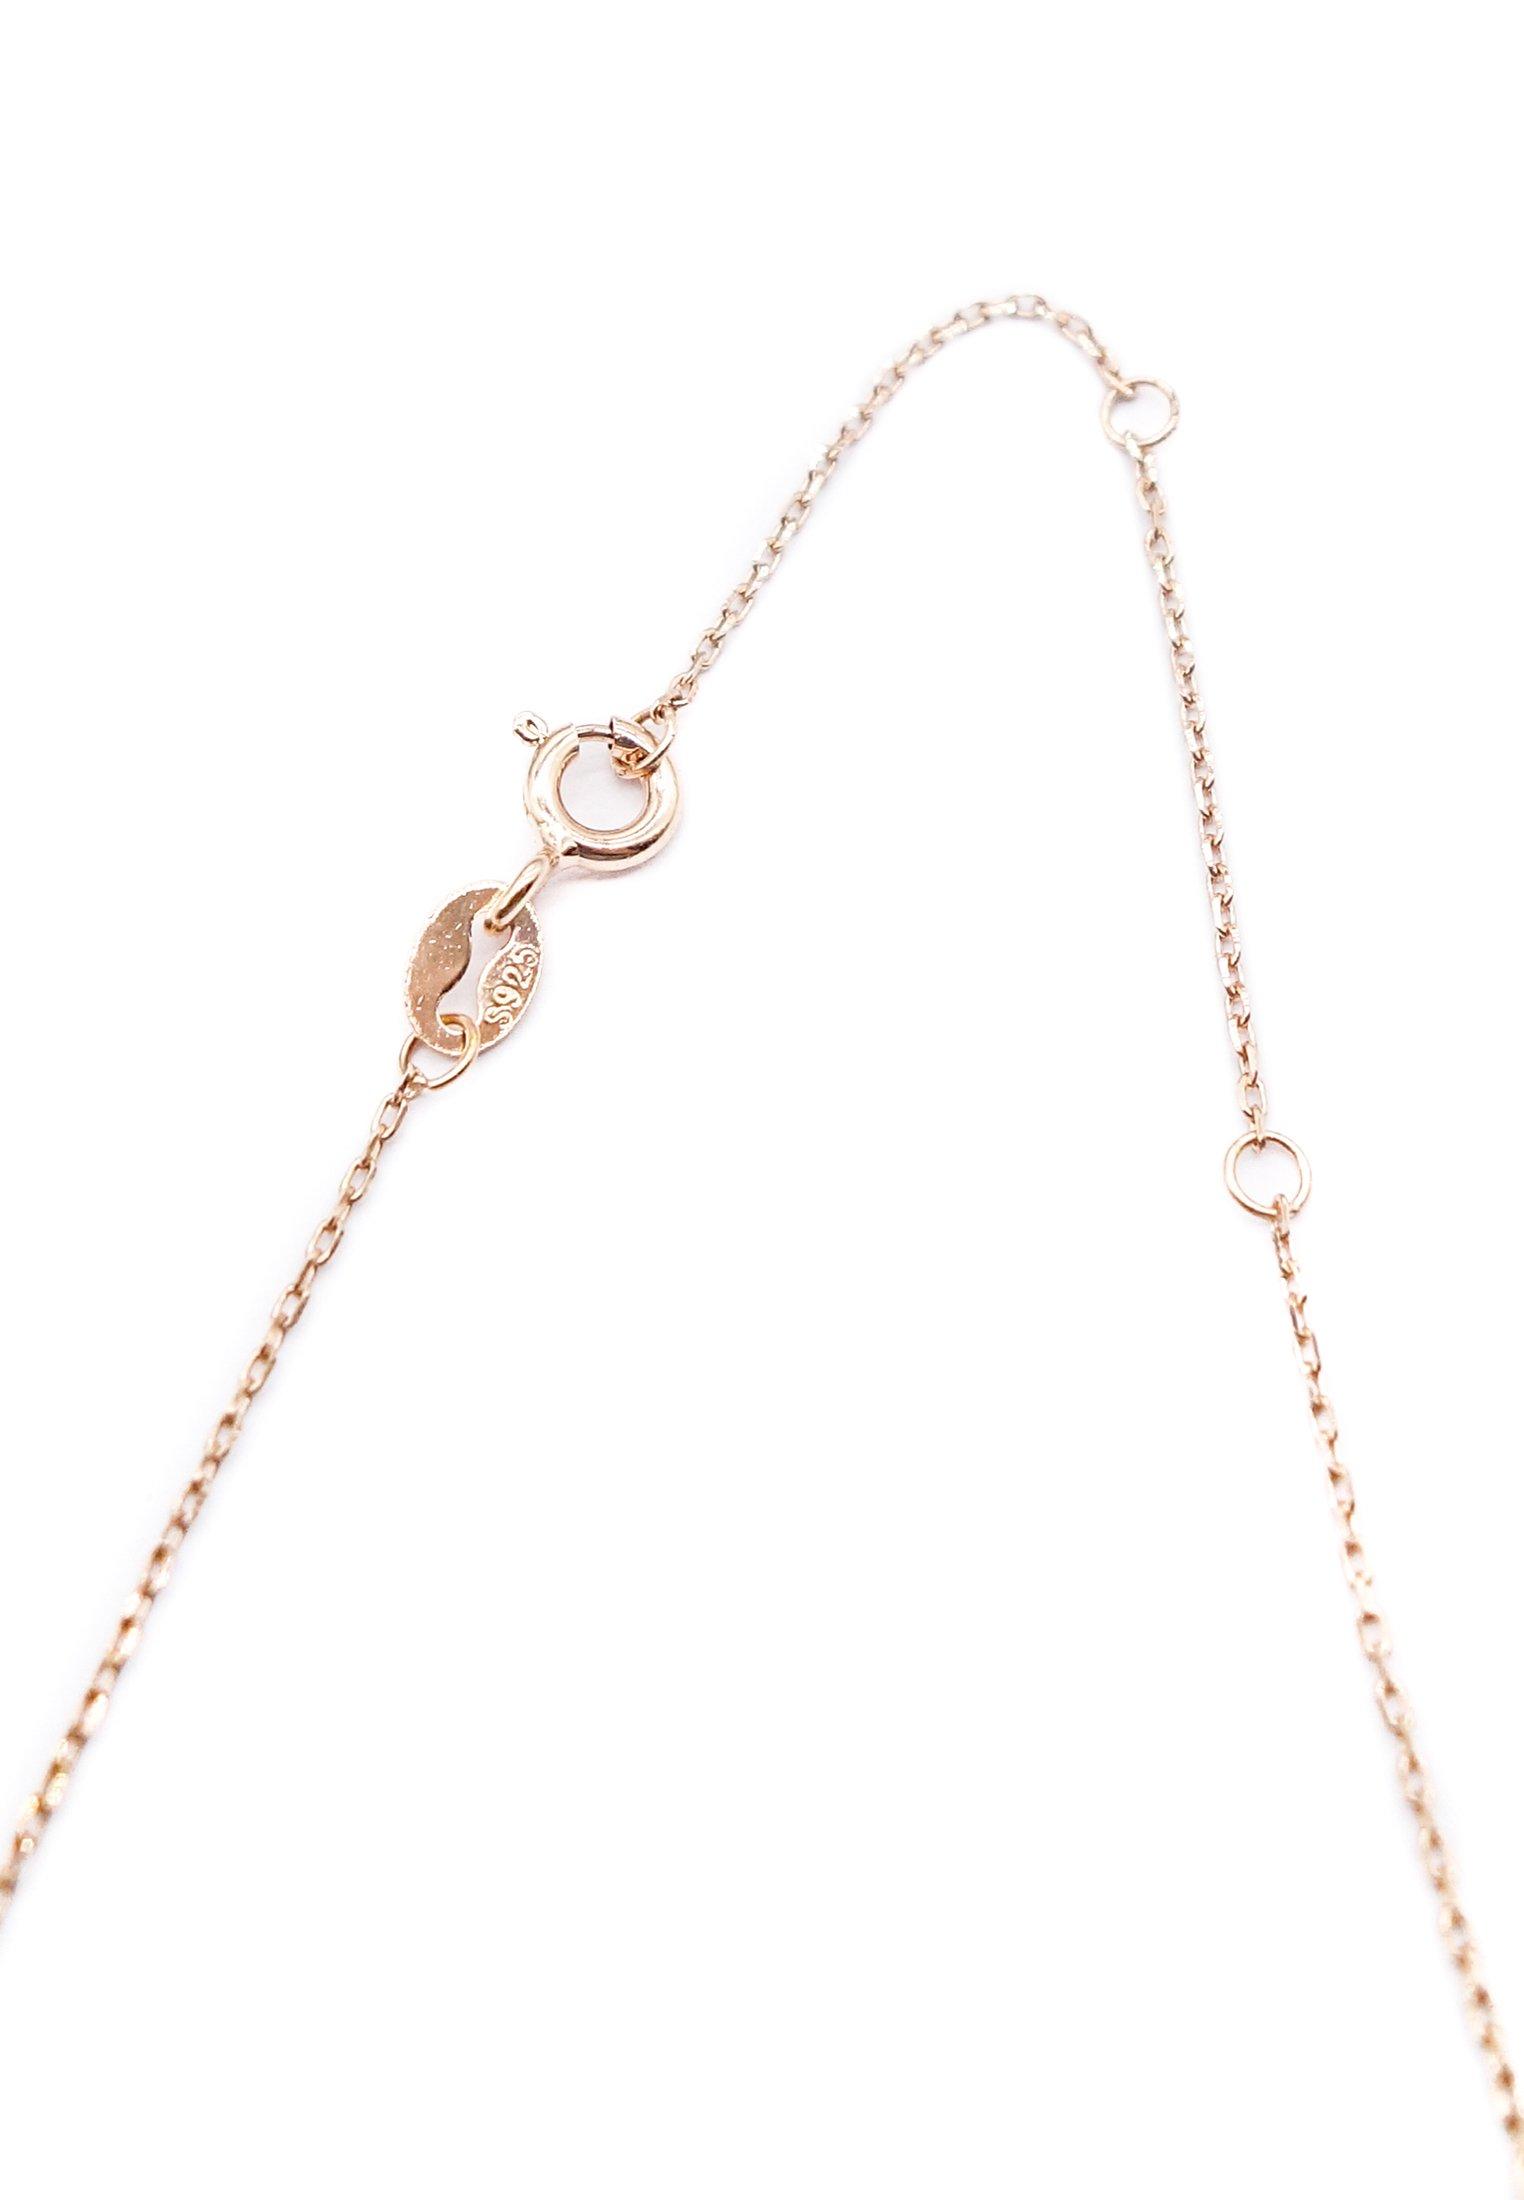 Arion Jewelry Chaîne - Halskette Gold